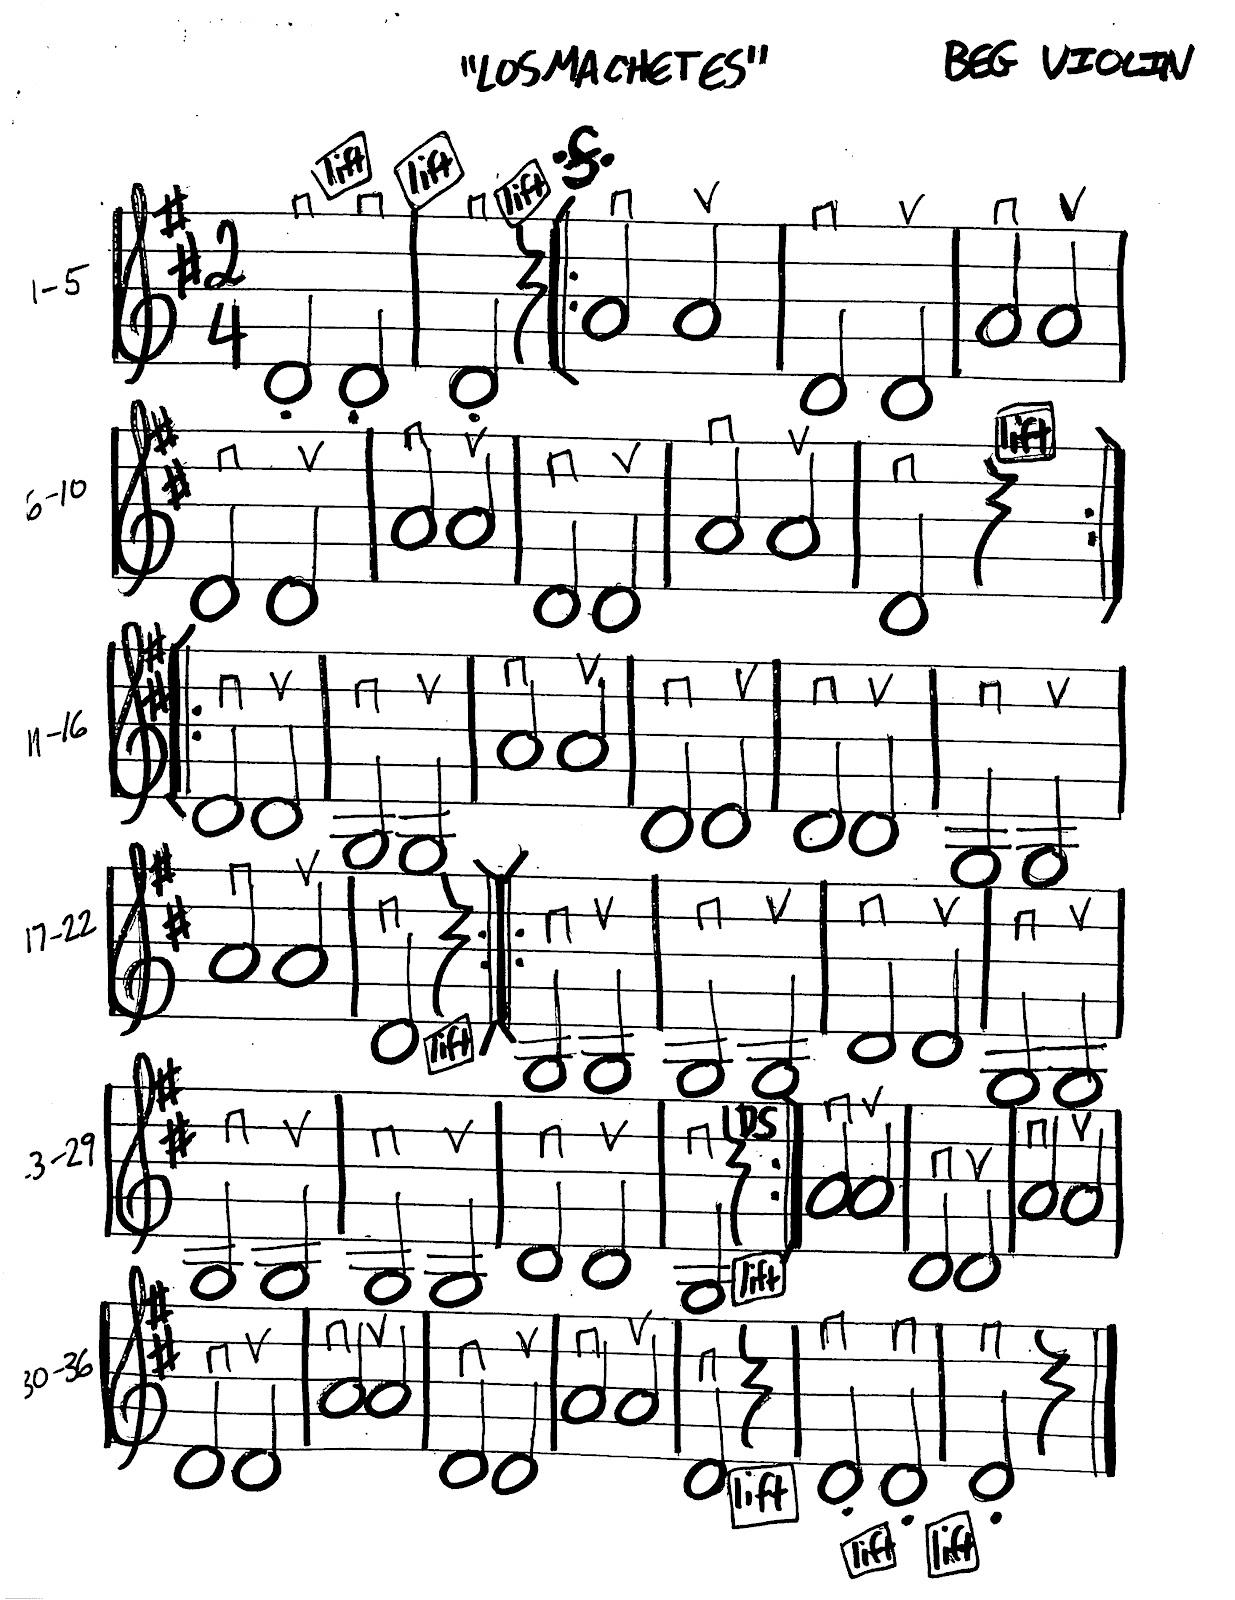 Miss Jacobson's Music: LOS MACHETES MUSIC WORKSHEETS